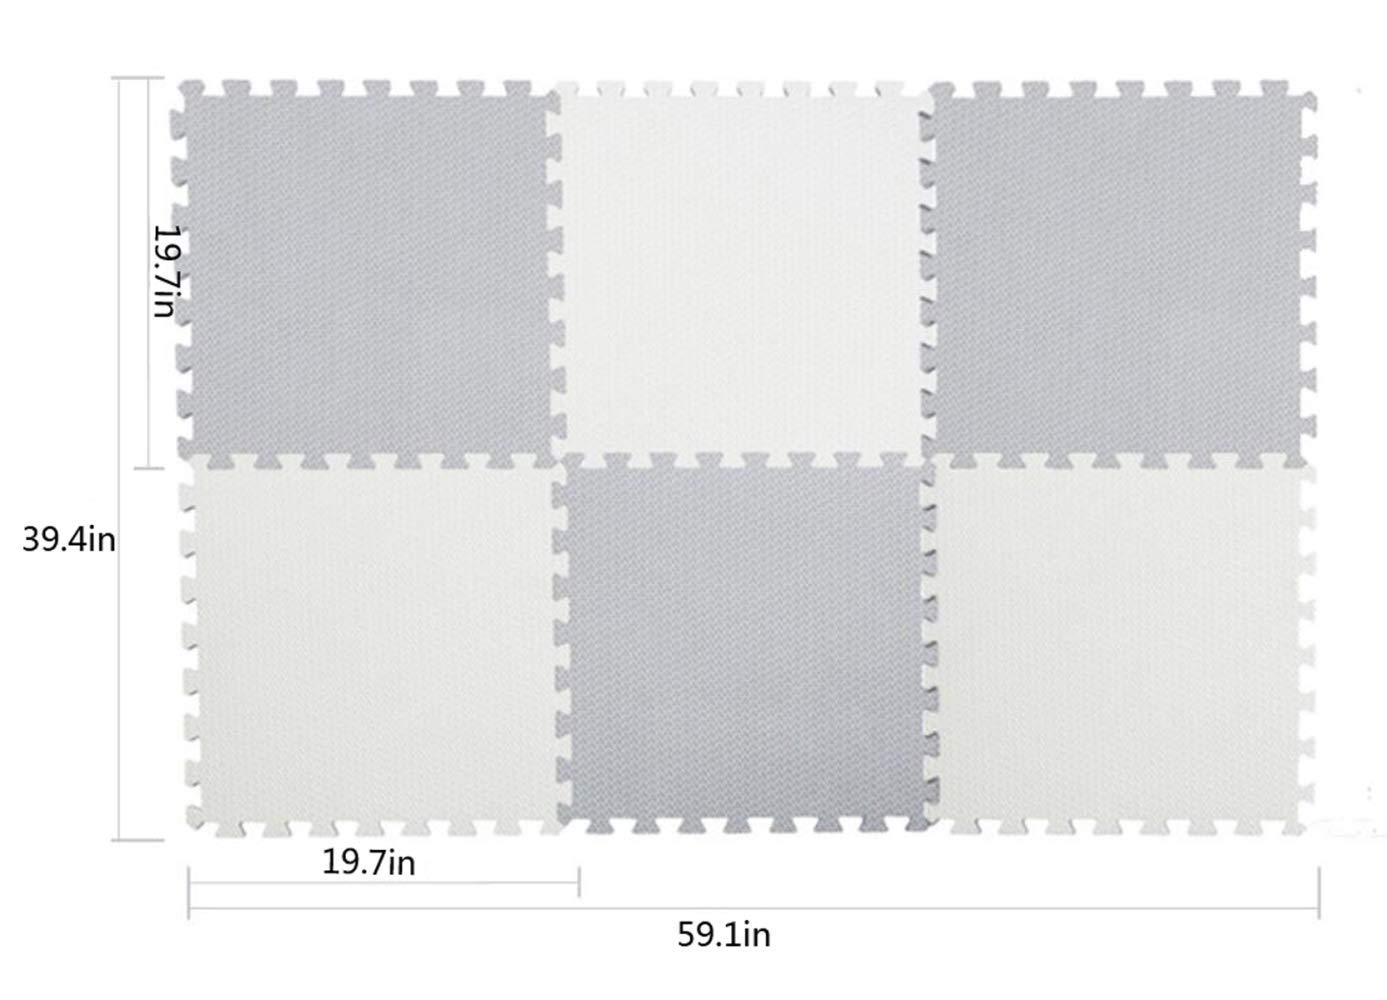 QXMEI Stitching High Elastic Foam Pad Puzzle Mat Children's Mat Crawling Mat Baby Bedroom Slip,Beige+Gray